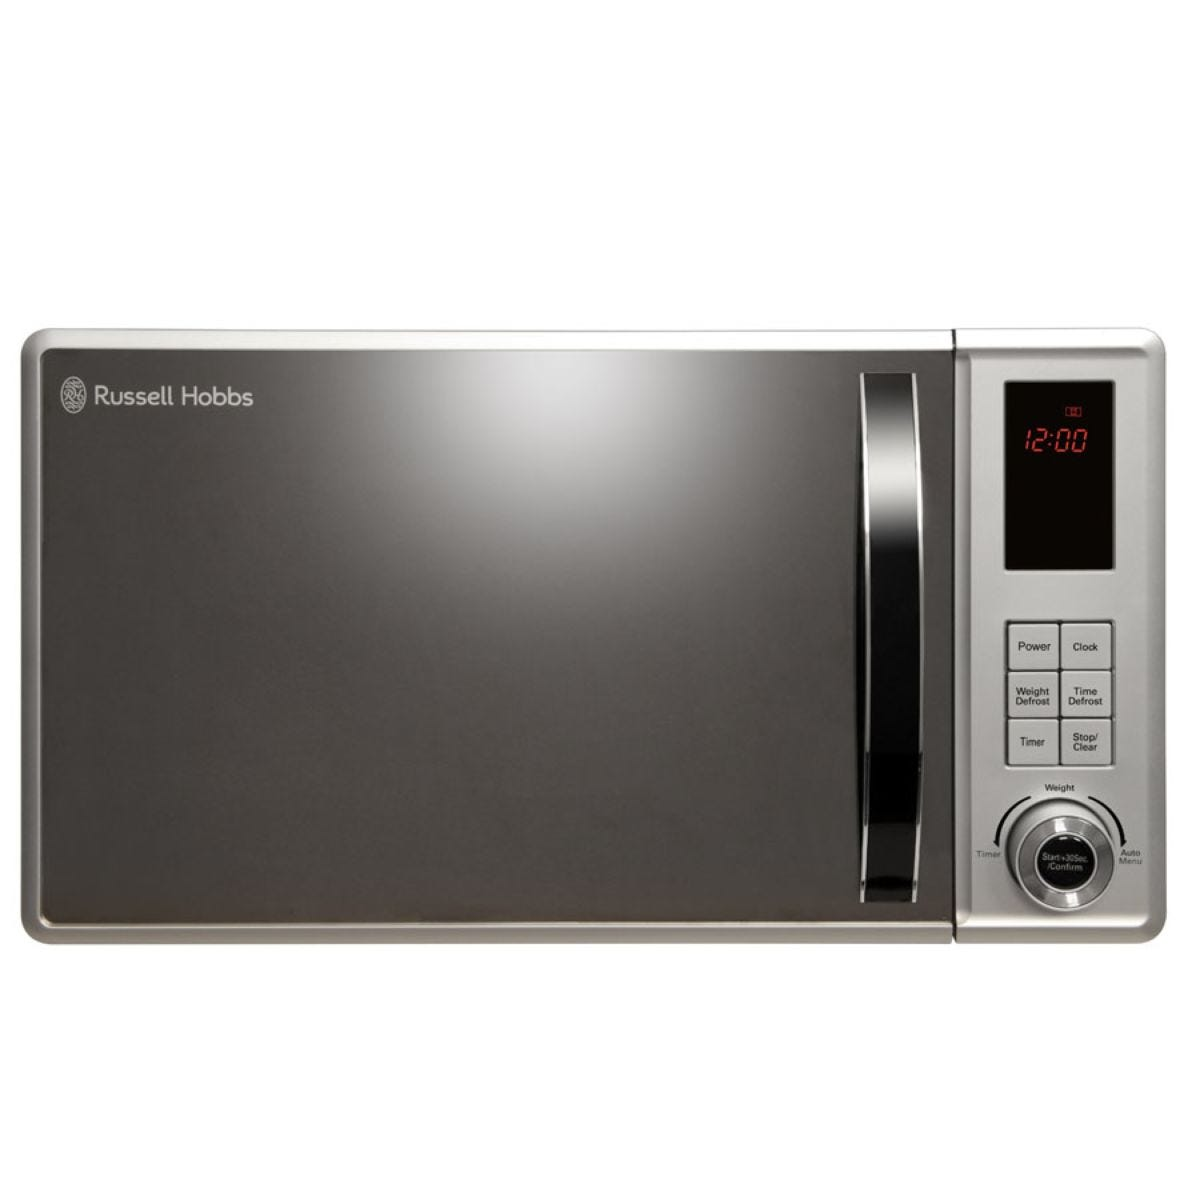 Russell Hobbs RHM2362S 800W 23L Digital Microwave – Silver